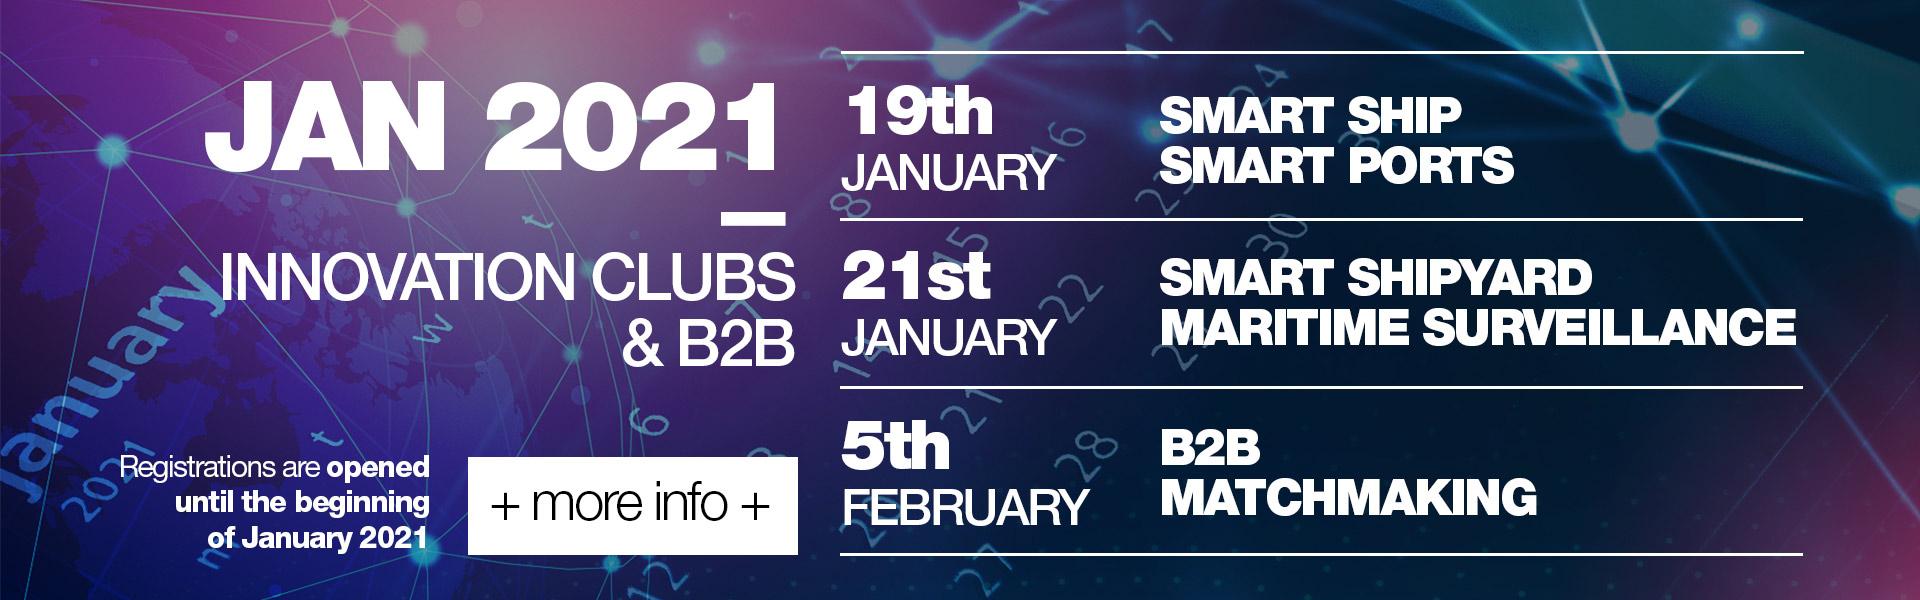 Innovation Clubs & B2B